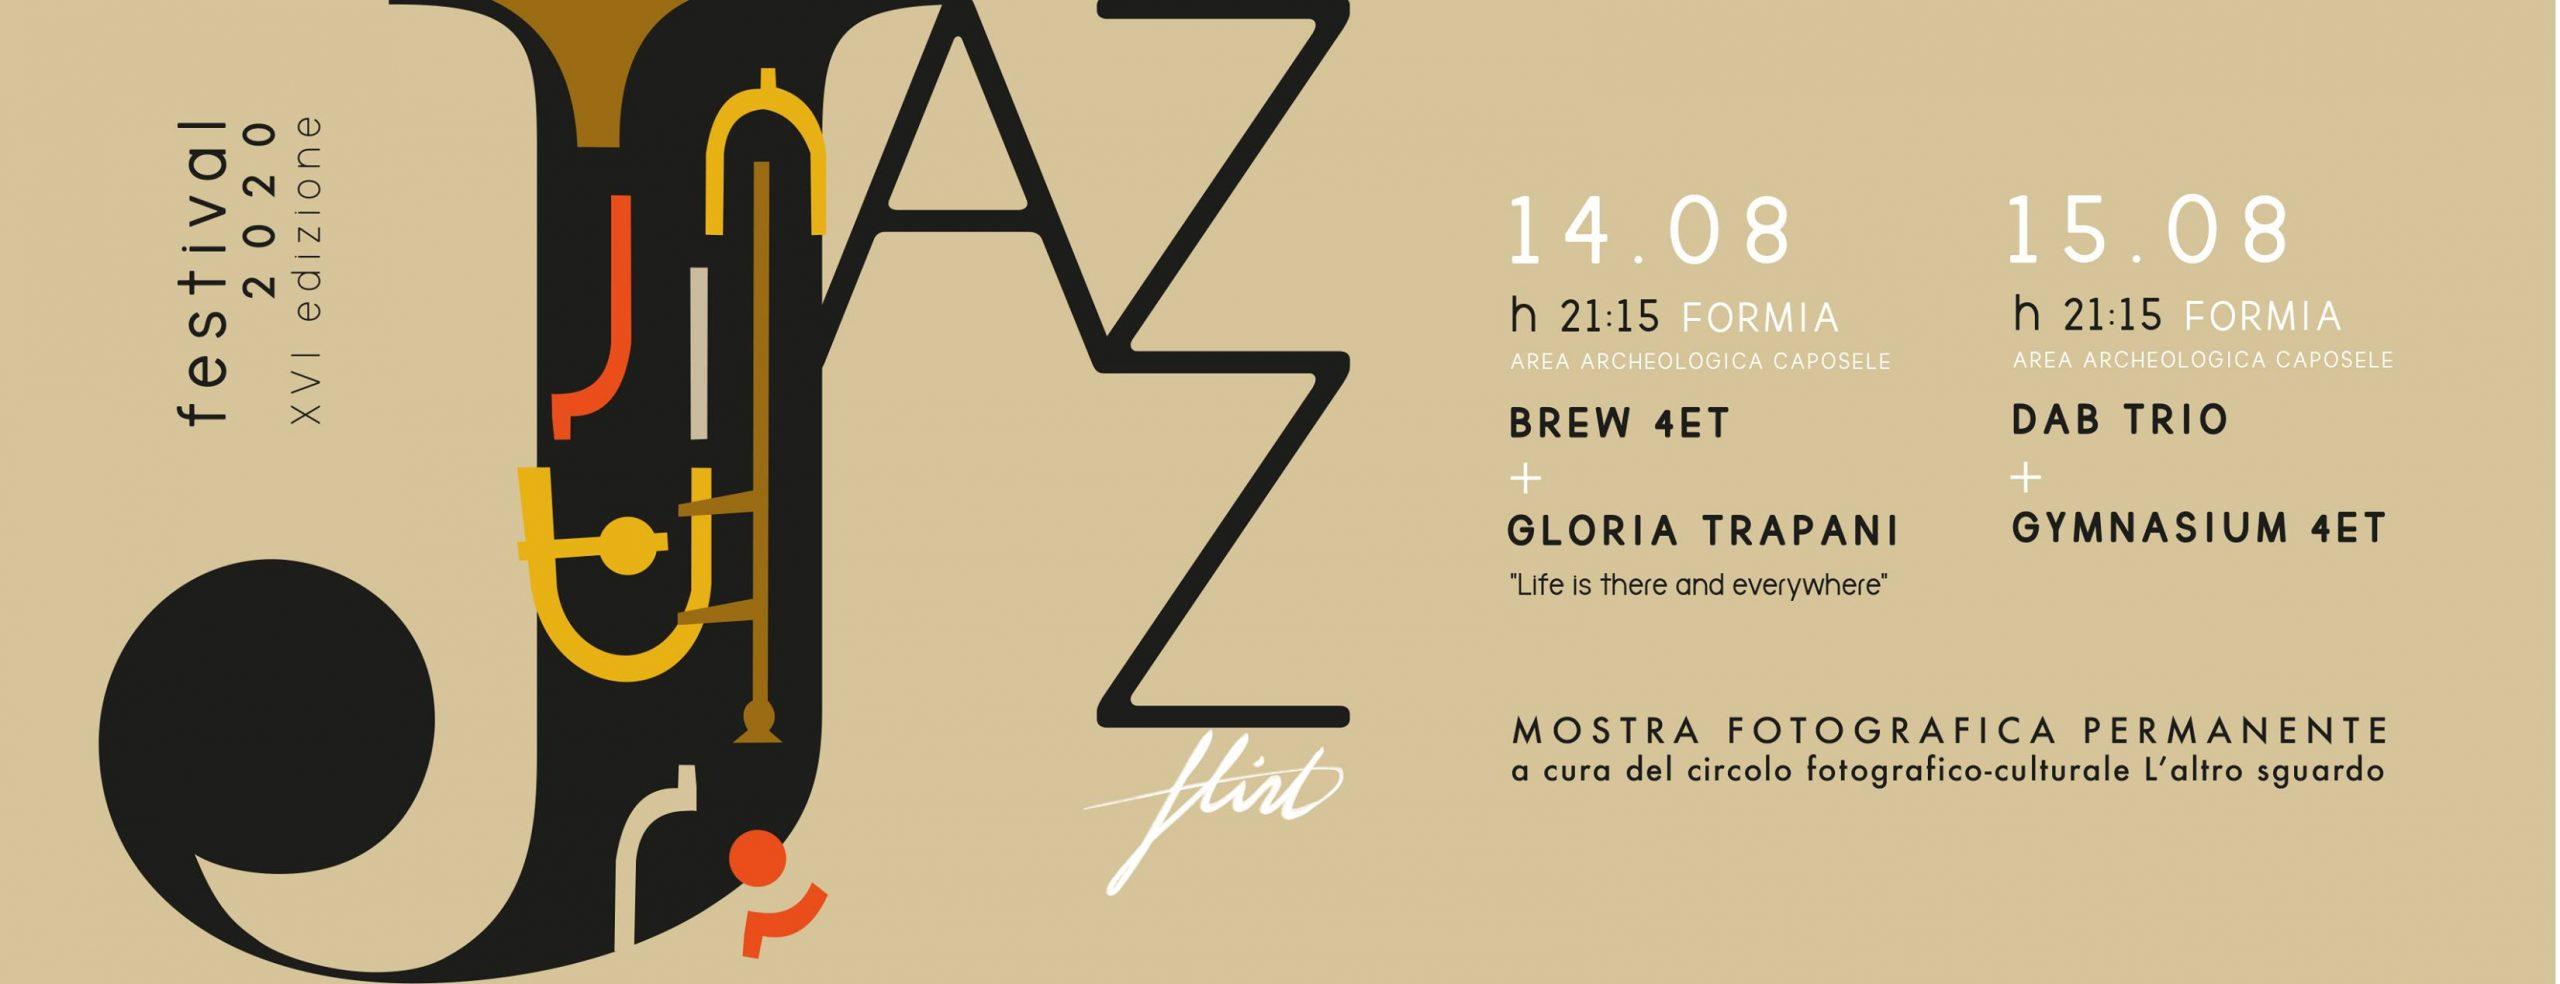 L'Estate del jazz ai tempi del Coronavirus – Jazzflirt Festival